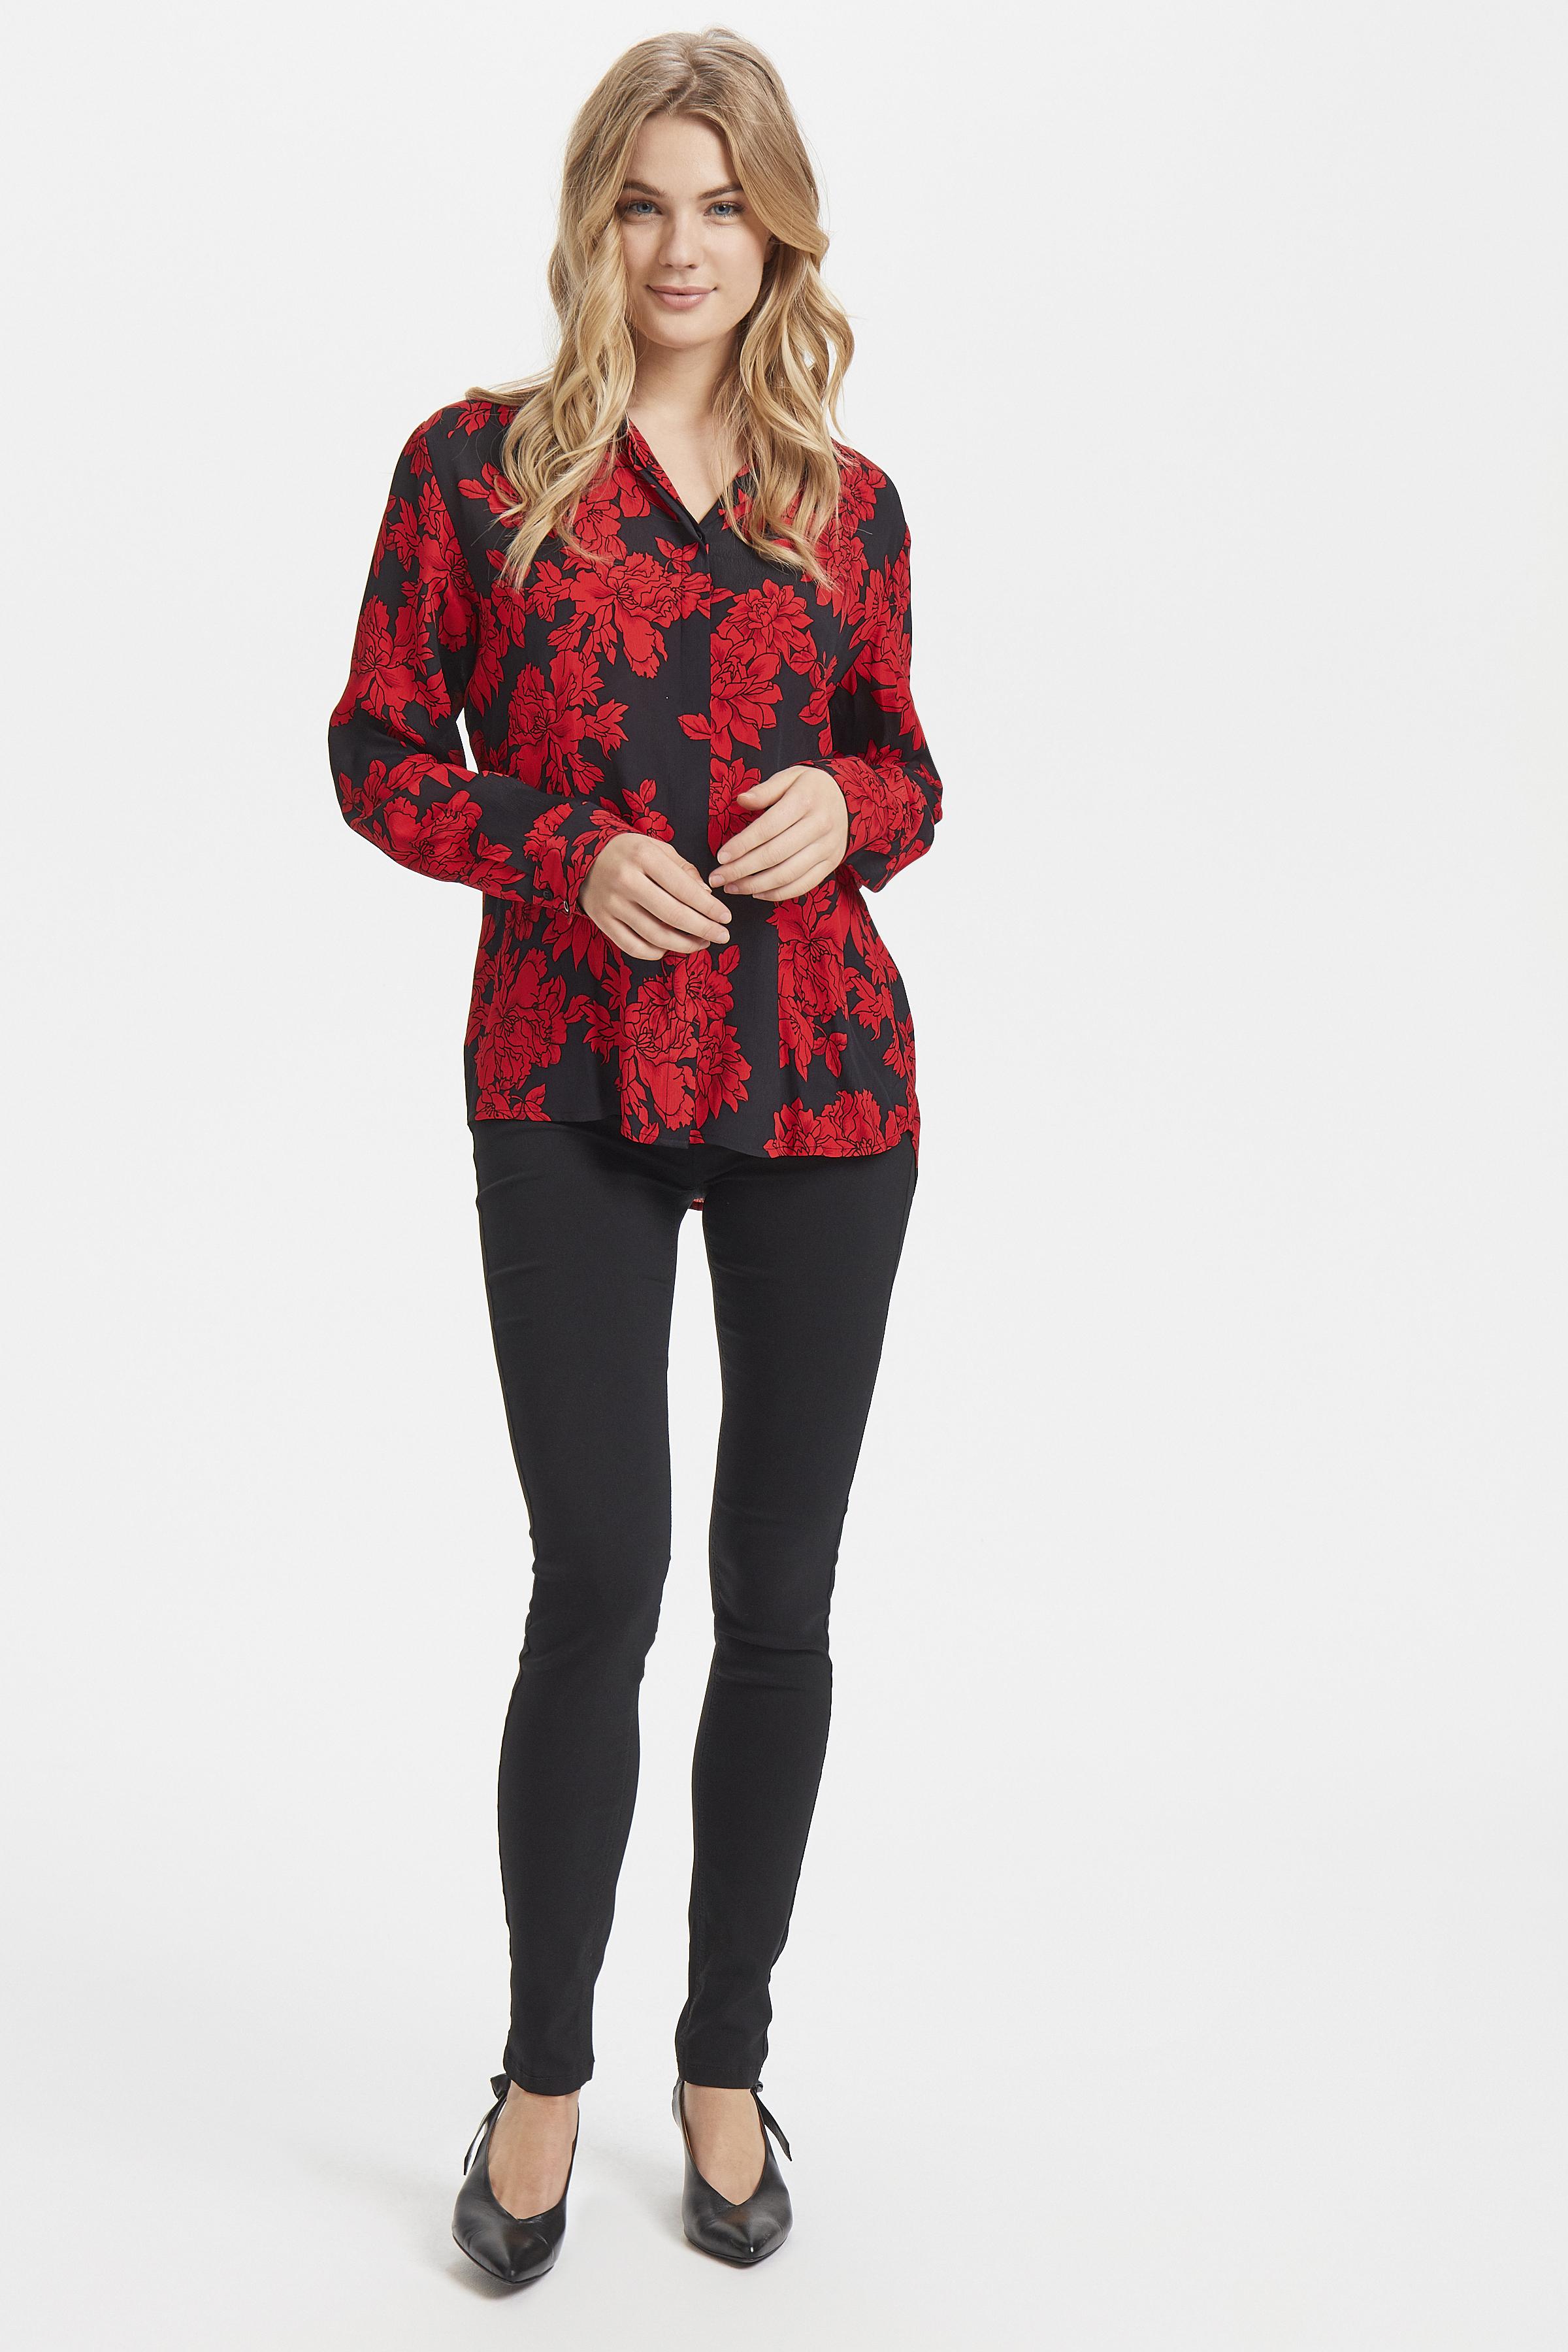 Black w. red flower